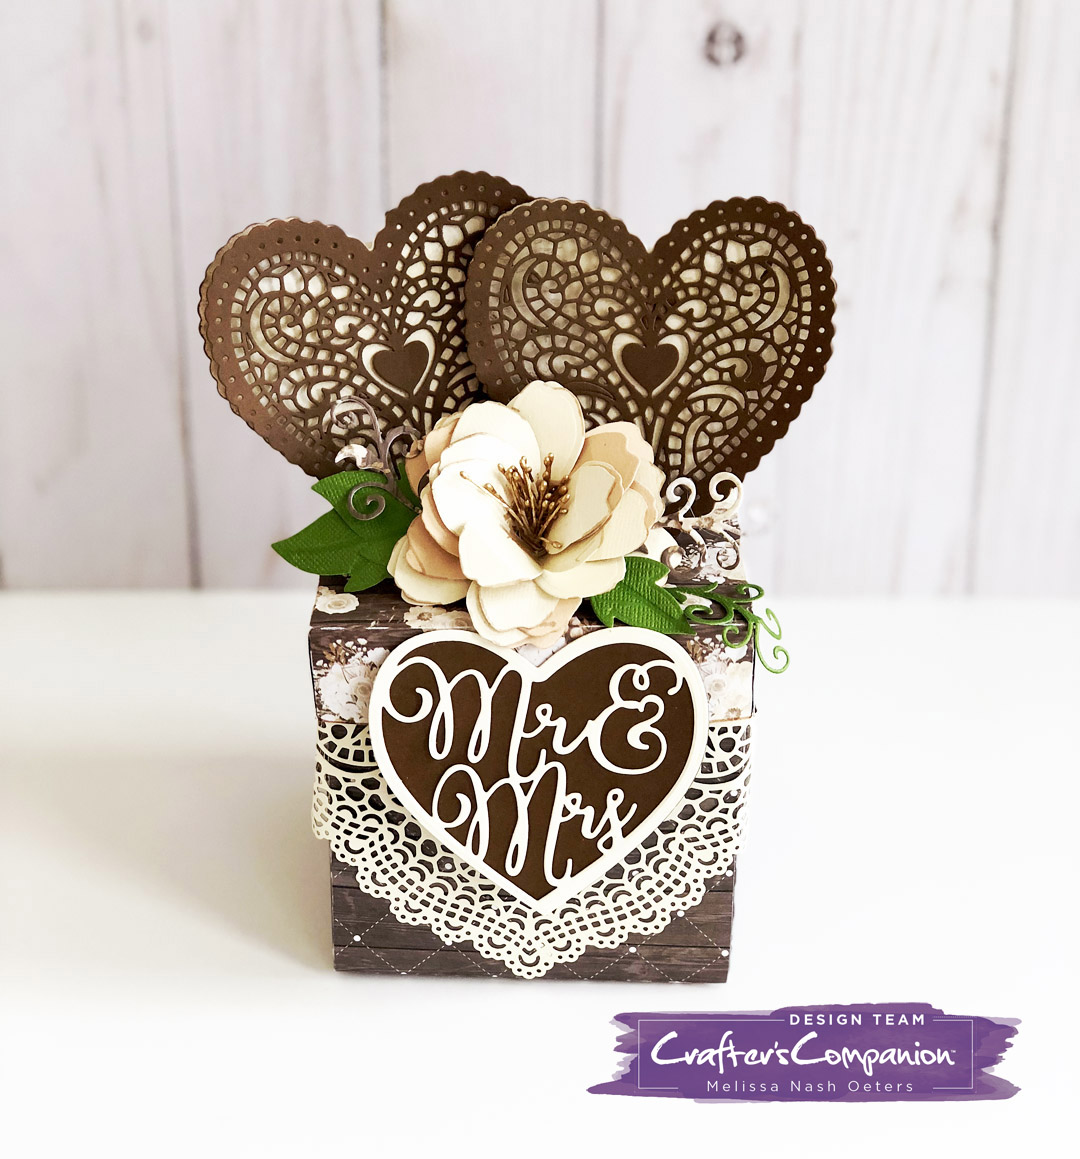 Crafter's Companion Bridal Bouquet에 대한 이미지 검색결과